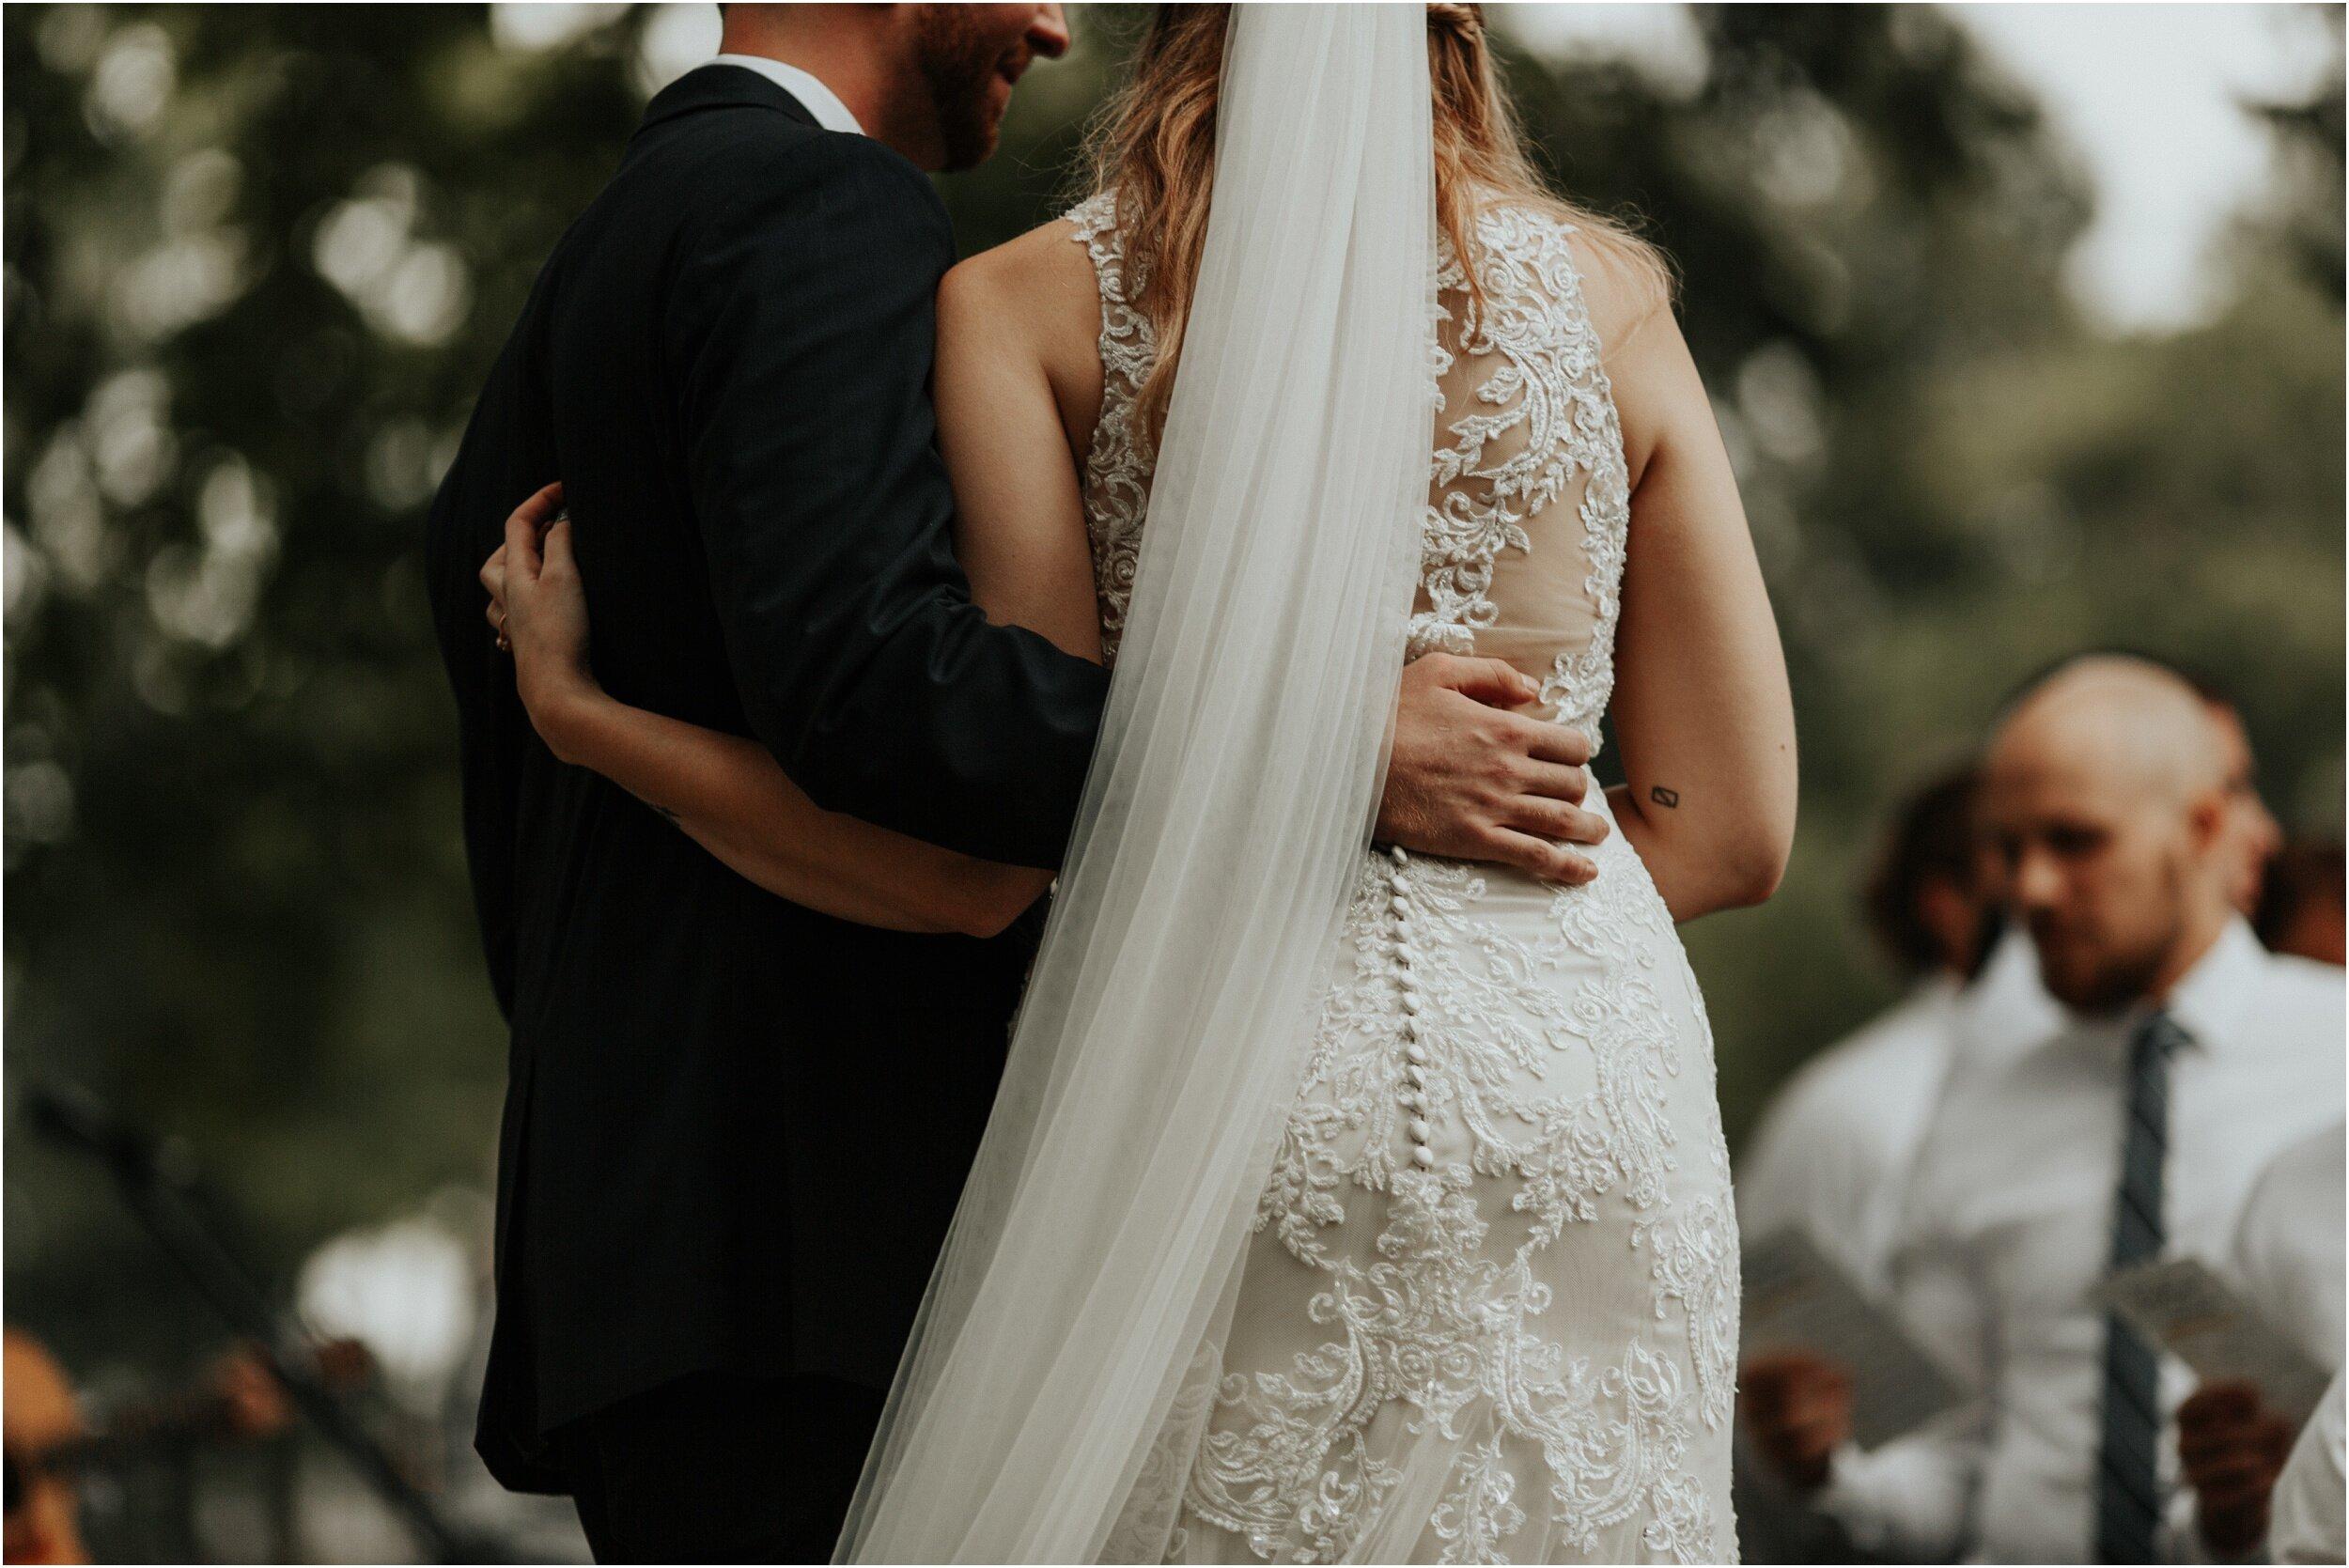 steph-and-jordan-cox-our-wedding-historic-shady-lane-compass-wedding-collective-hazel-lining-photography-destination-elopement-wedding-engagement-photography_0064.jpg